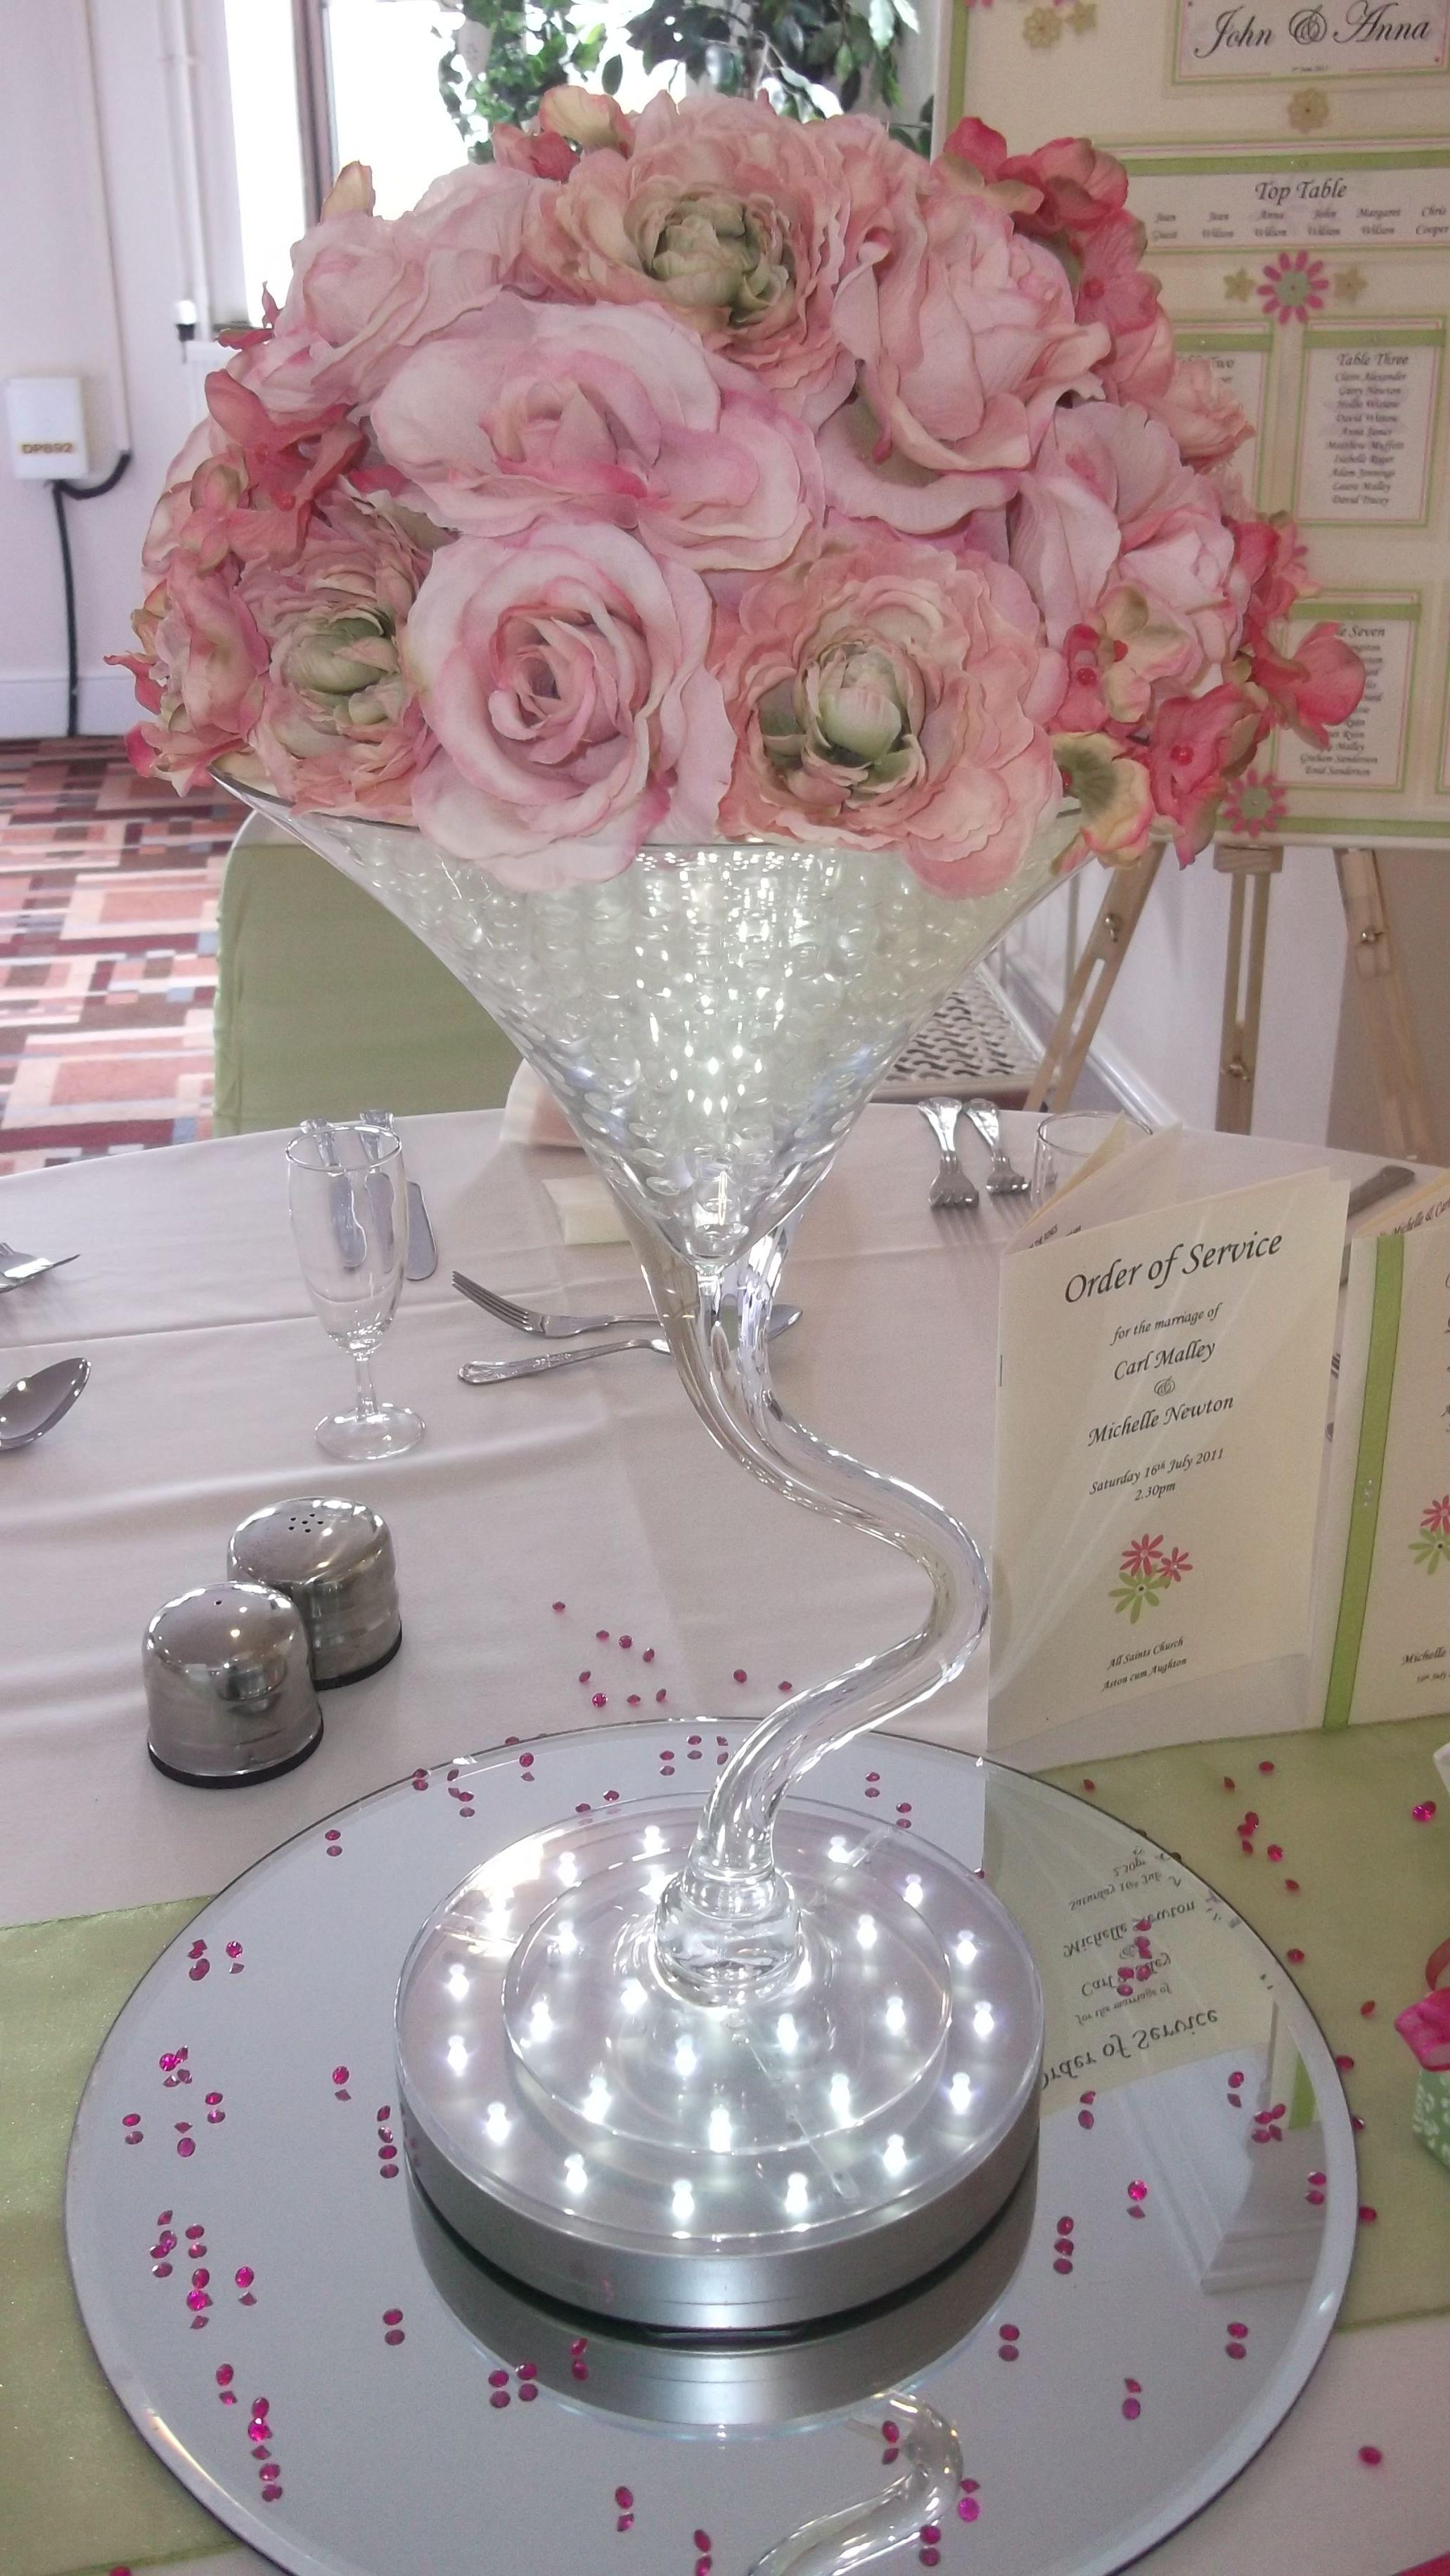 Gel beads in Martini glasses centerpiece idea 2  Wedding Event  Party Ideas  Martini